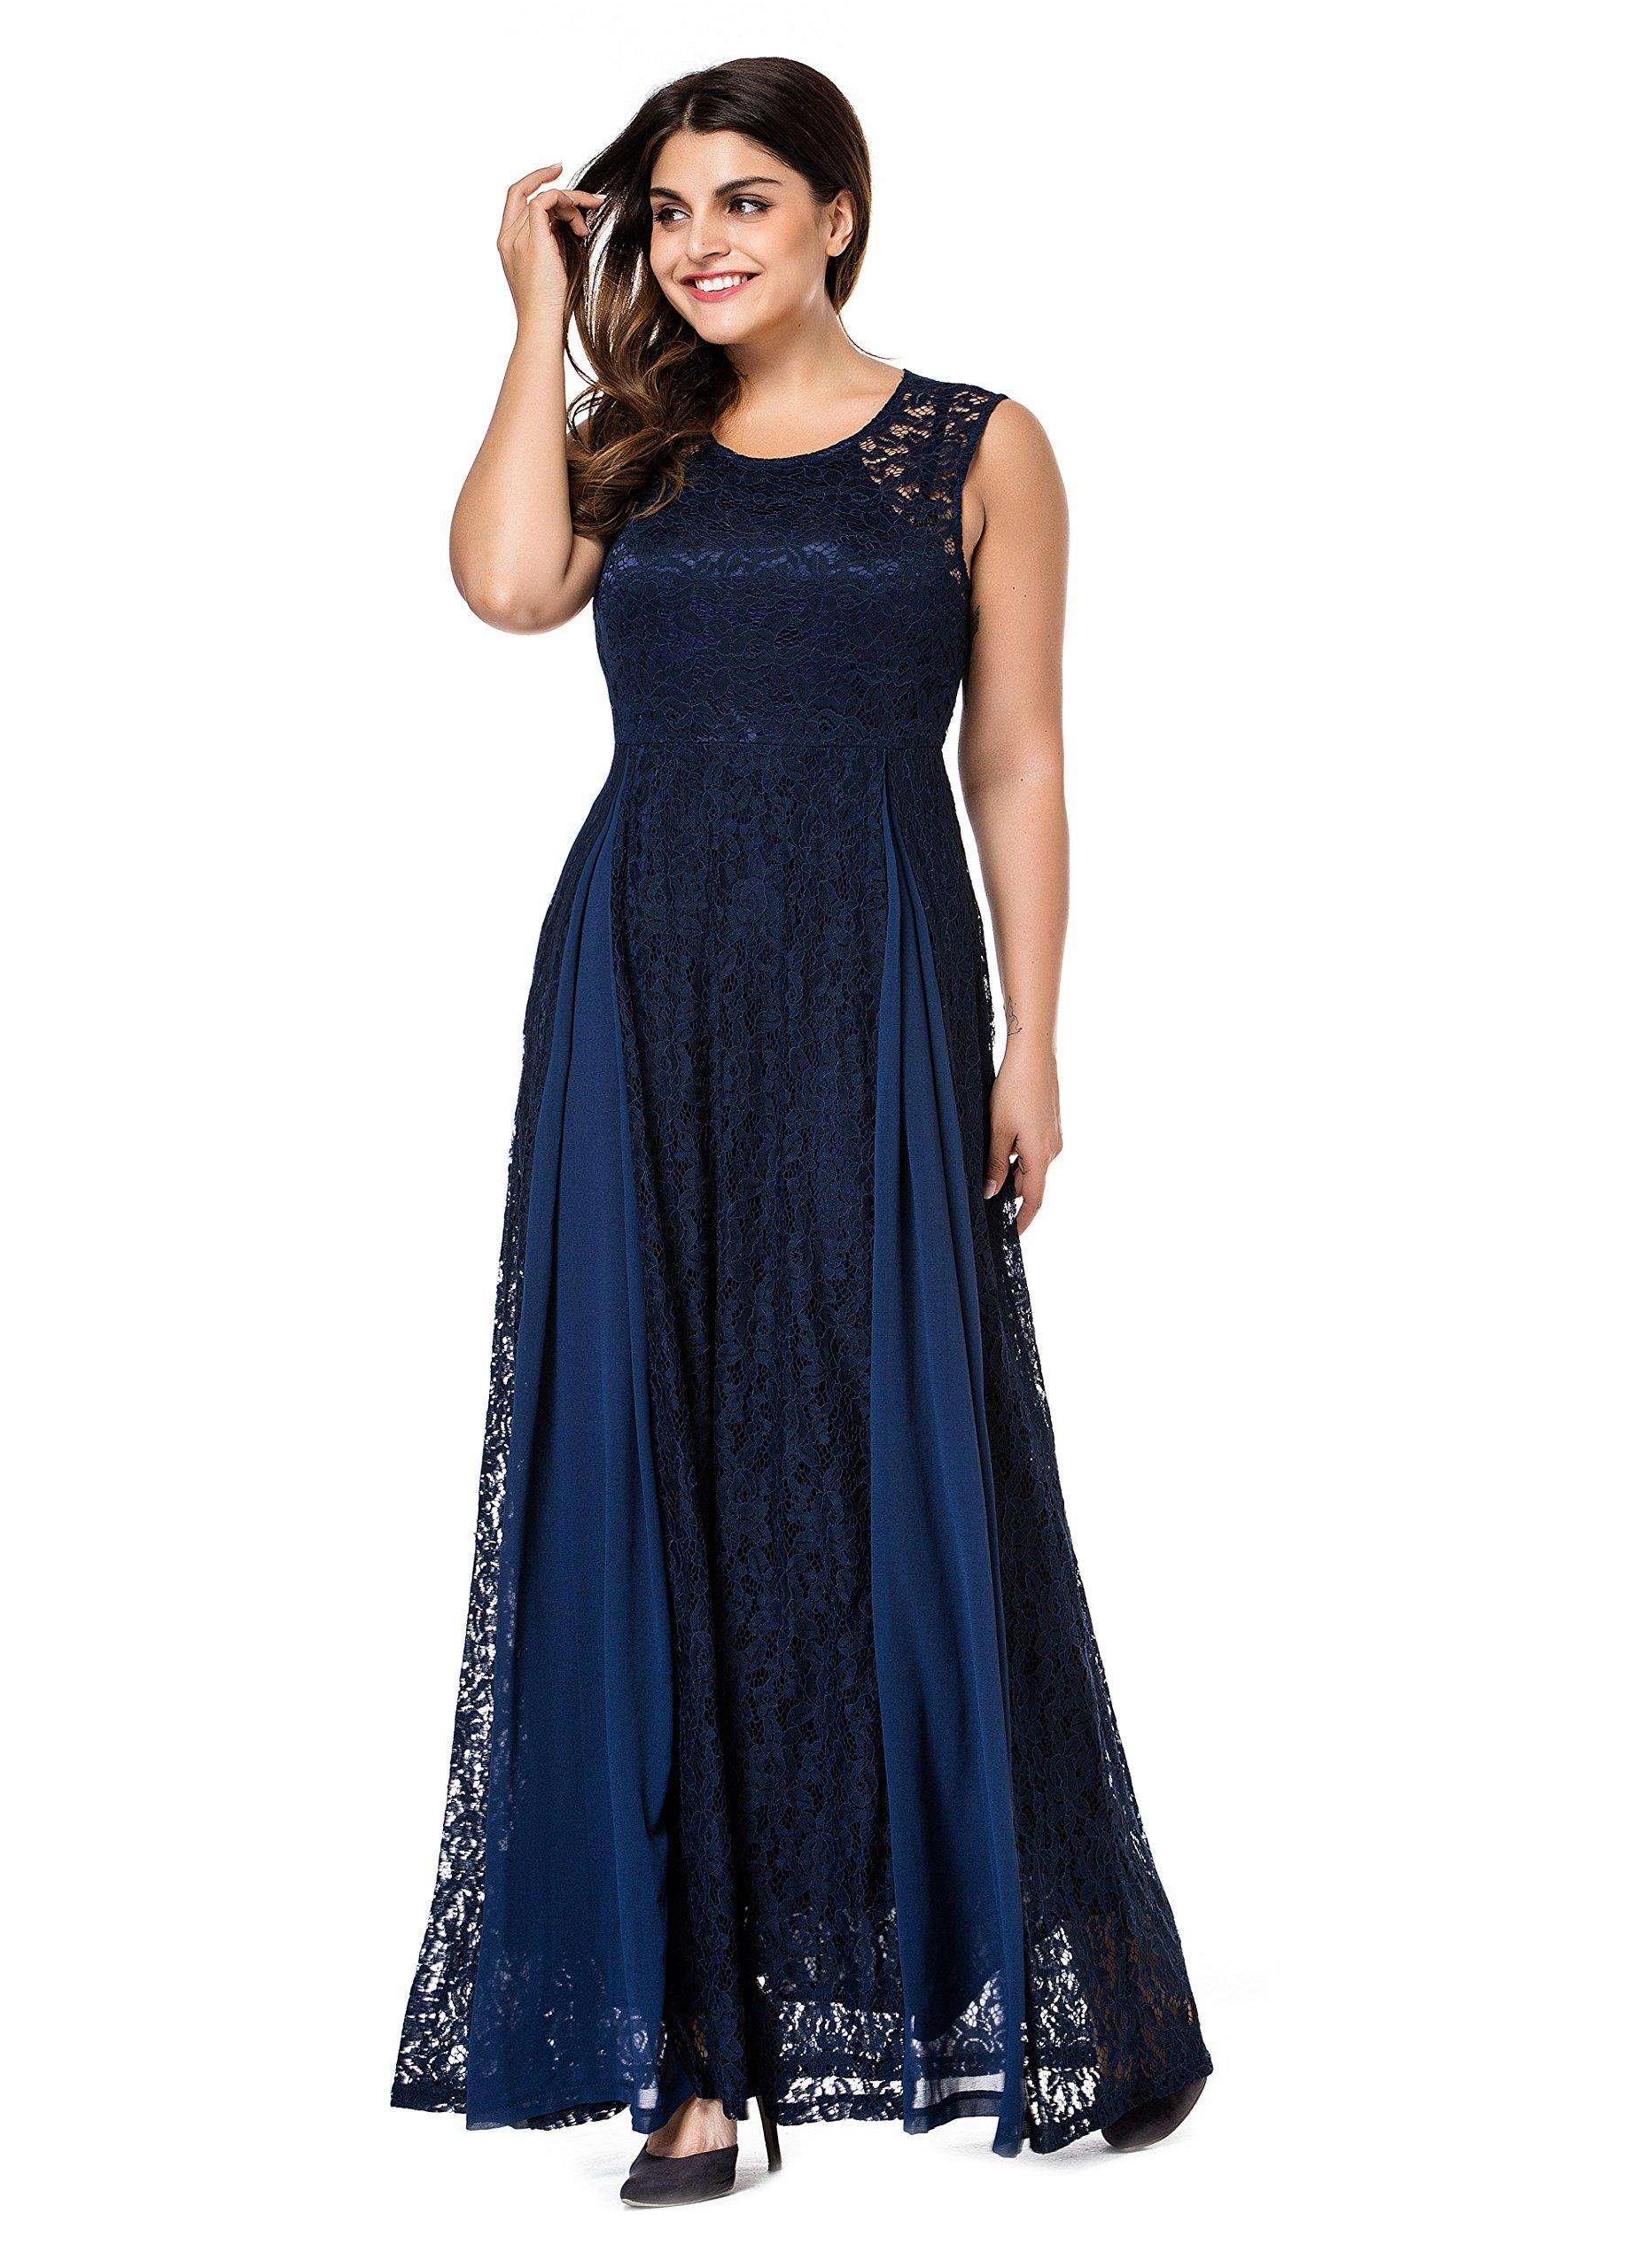 Esprlia Women's Plus Size Lace Sleeveless Evening Party Formal Maxi Dress - 3X Plus - Blue